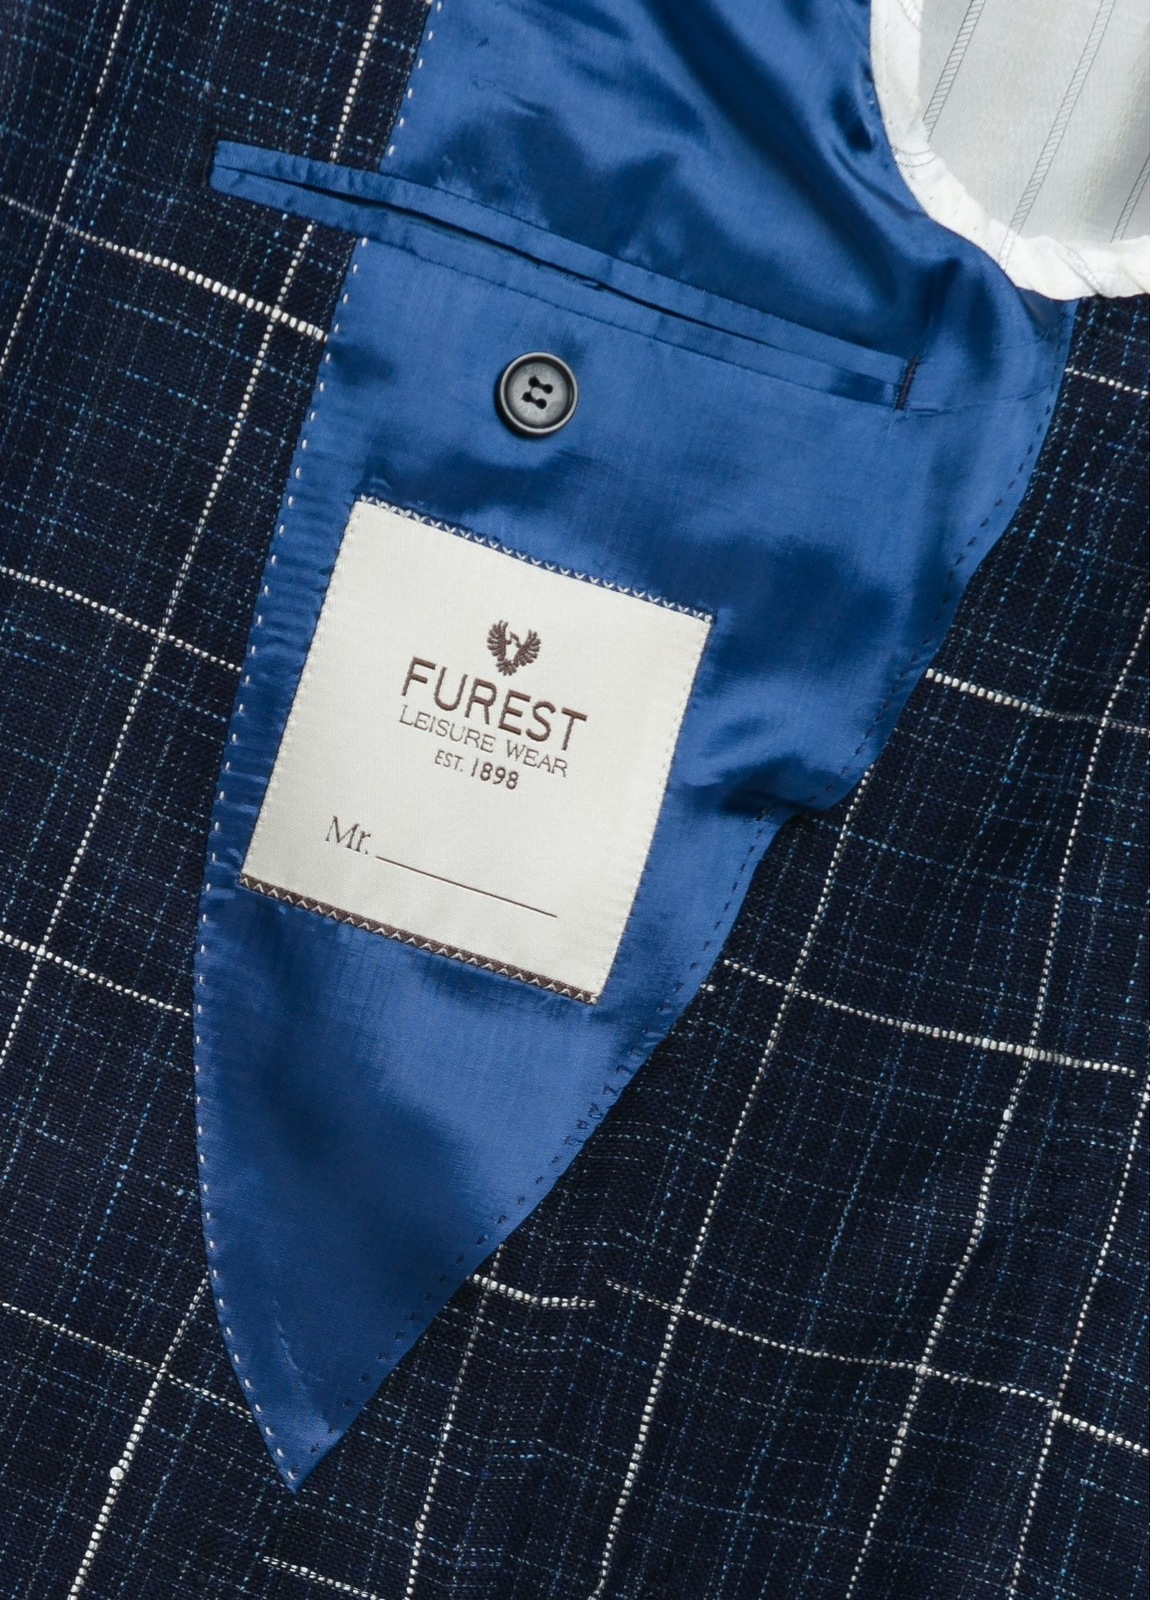 Americana SOFT JACKET Slim Fit con diseño cuadro ventana color azul, 90% Viscosa 5% Lino 5% Algodón. - Ítem3